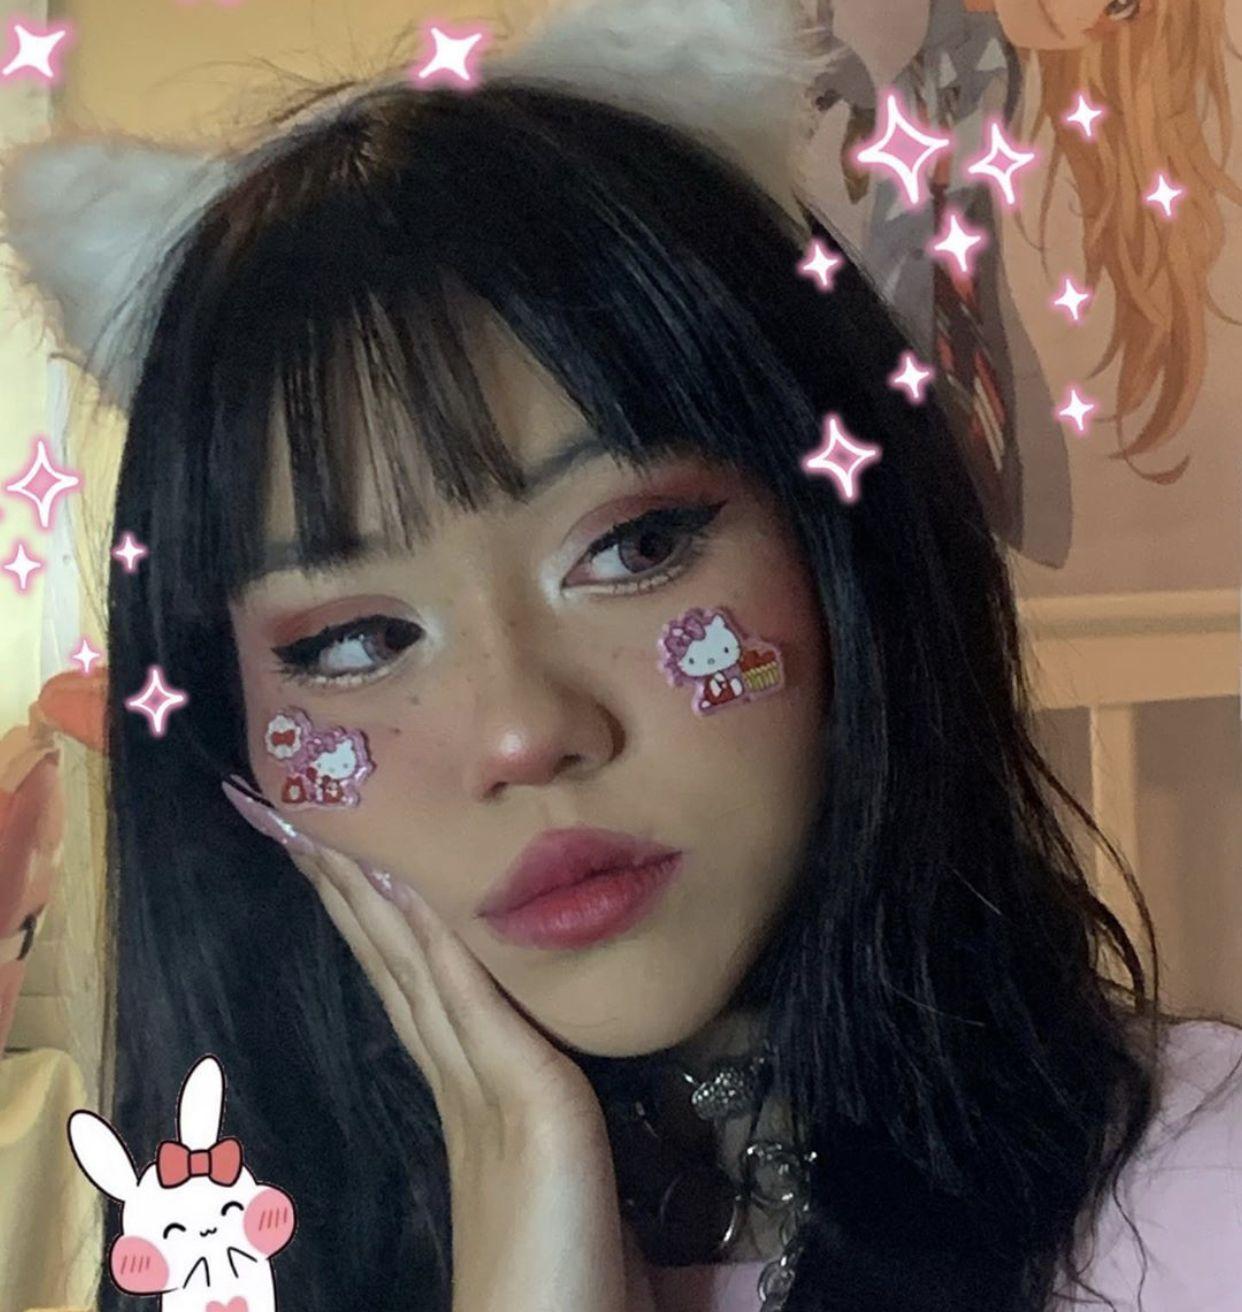 Alaiineeee In 2020 Bad Girl Aesthetic Cute Makeup Aesthetic Girl